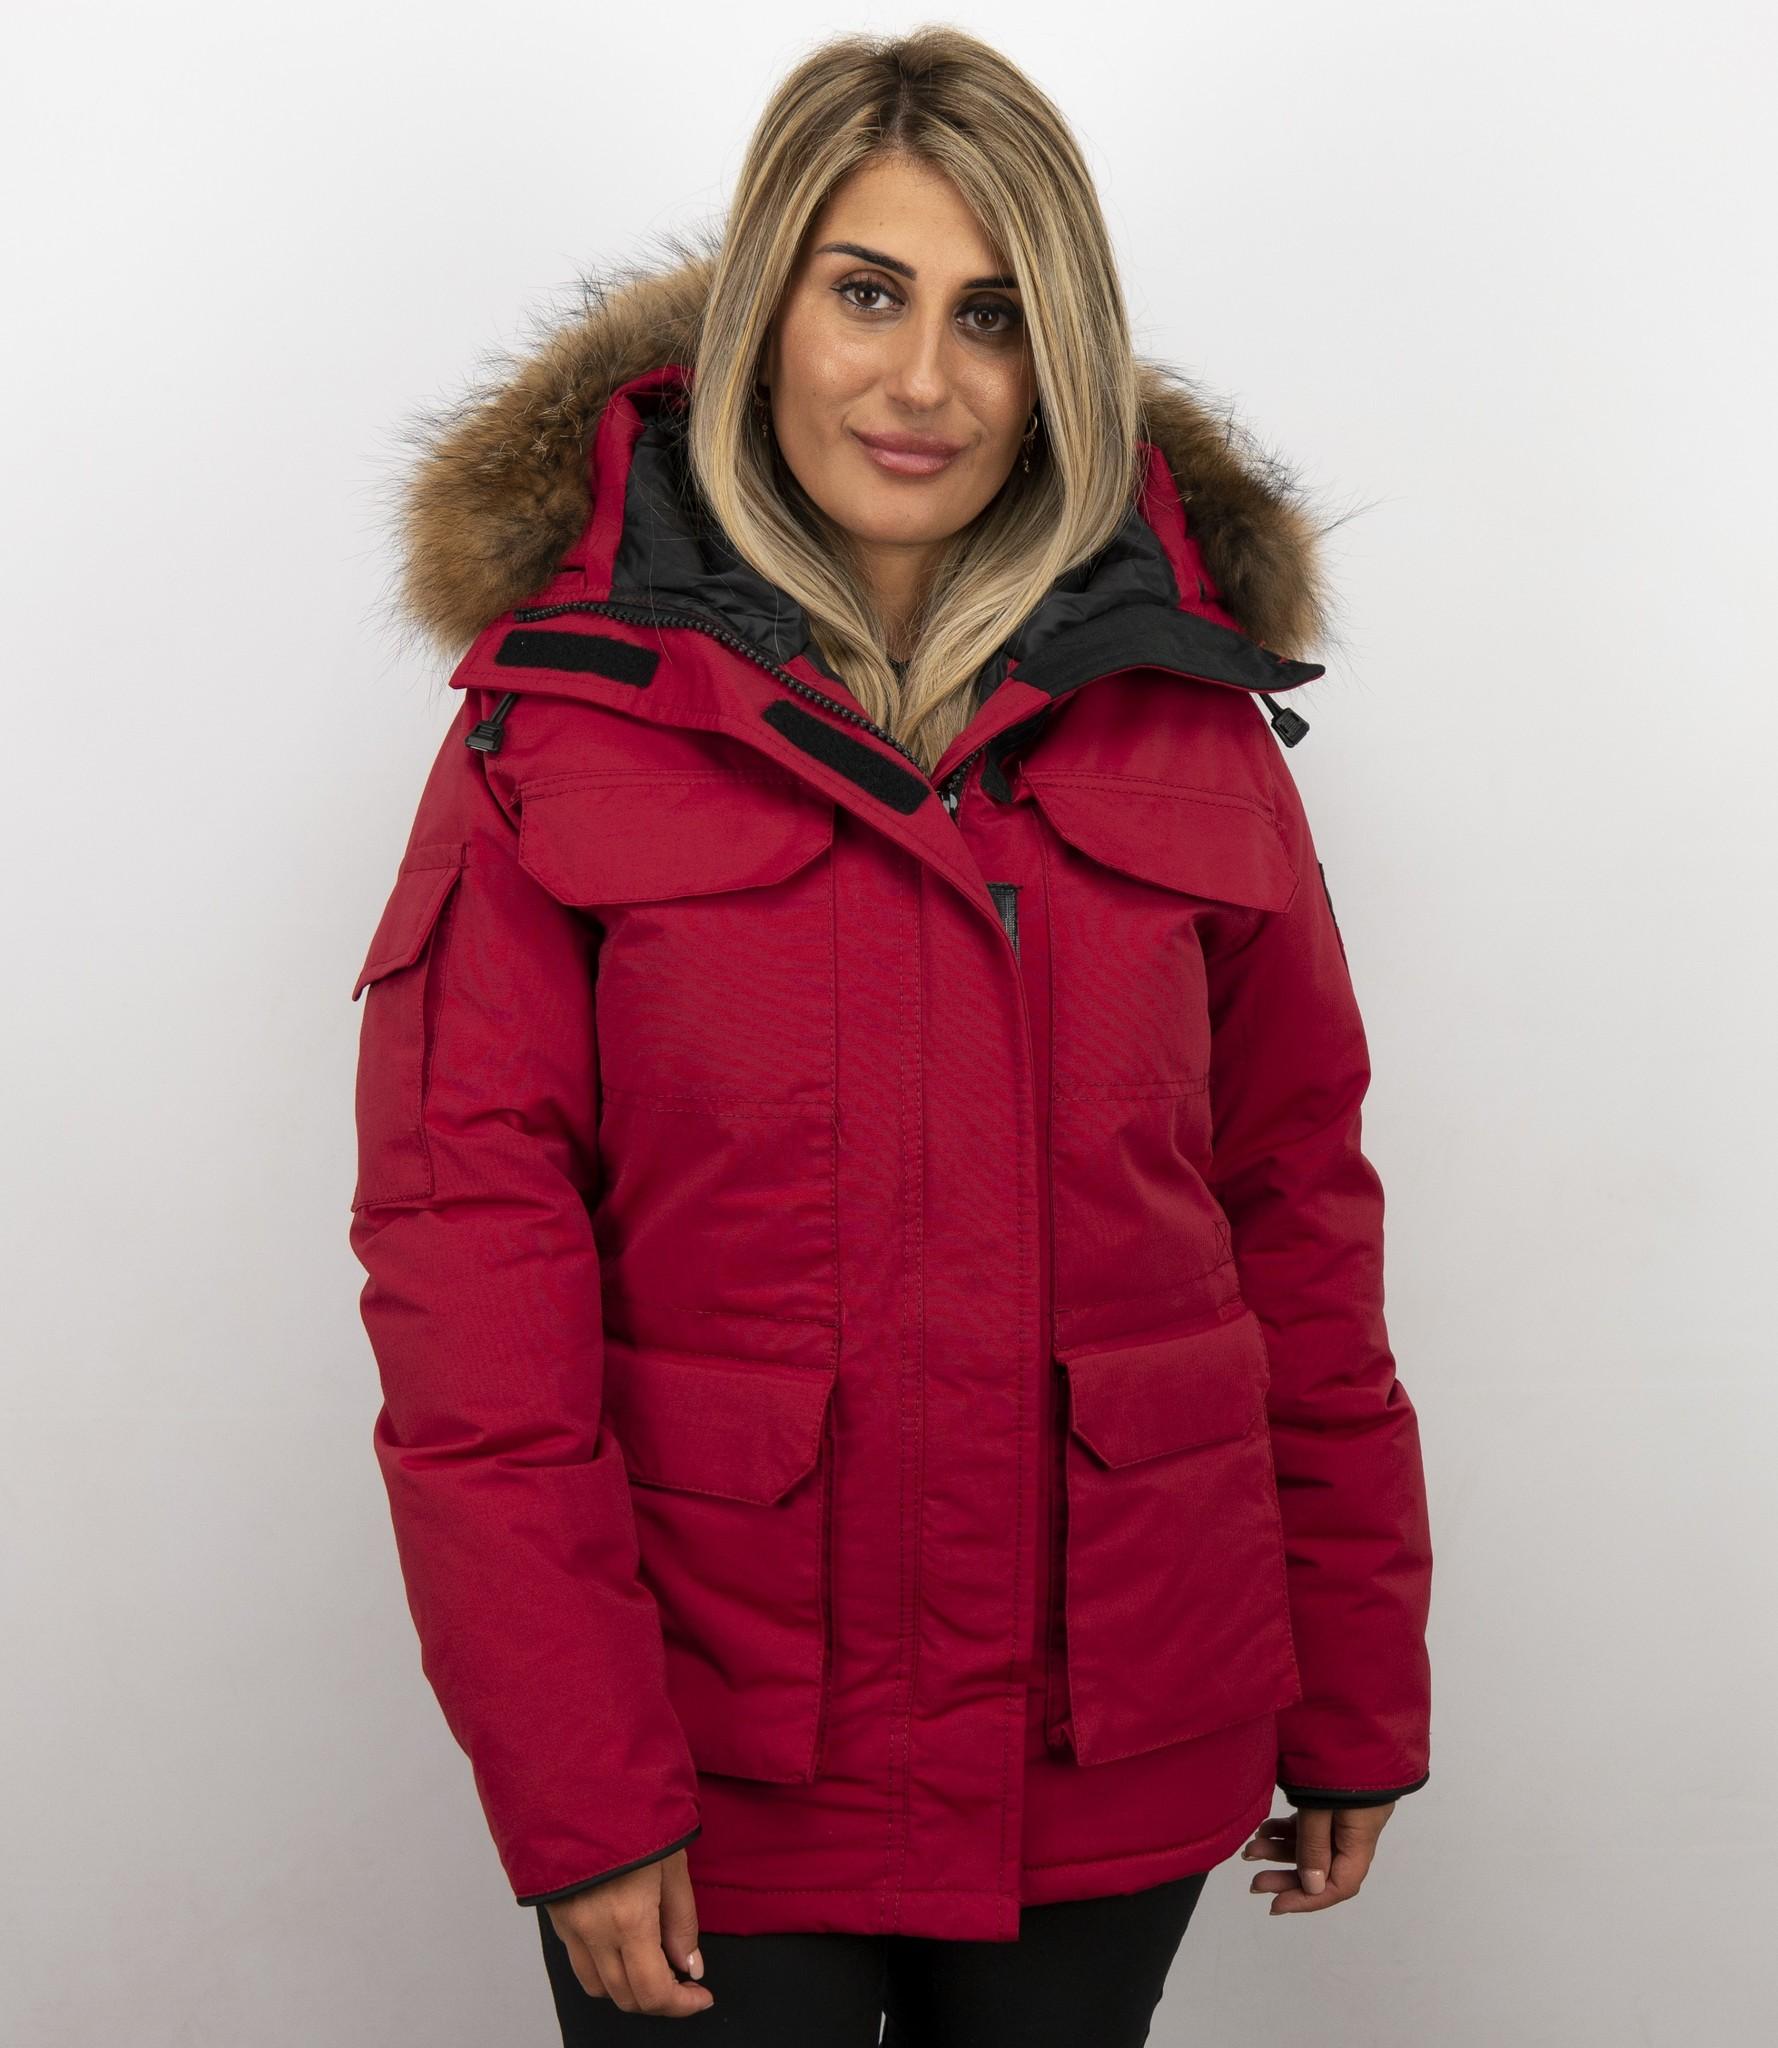 New York Discover best verkocht Dames Winterjas   Rode winterjas met capuchon   - StyleItaly.nl